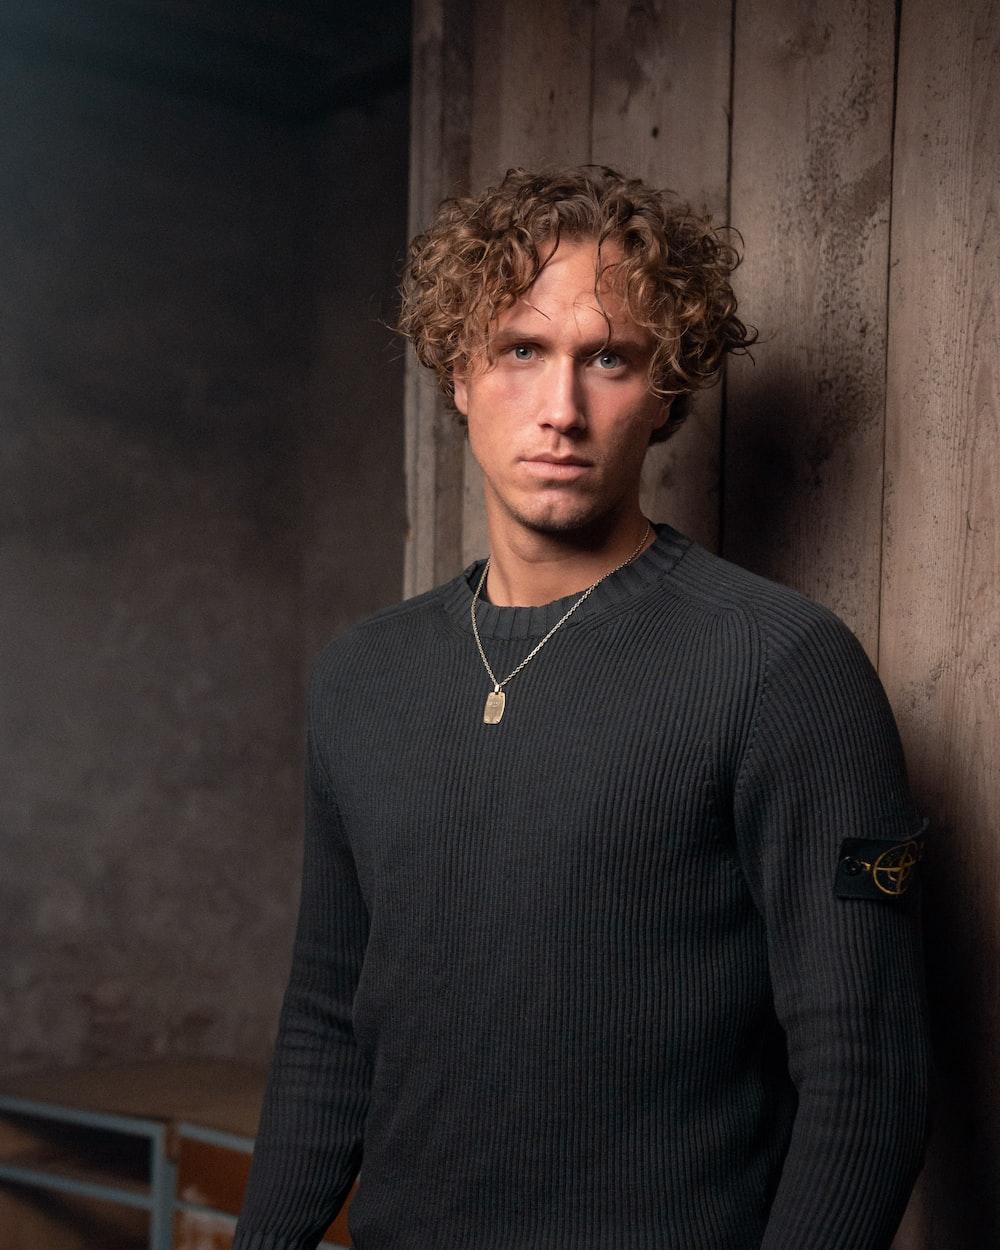 man wearing black knit sweater standing near brown wall